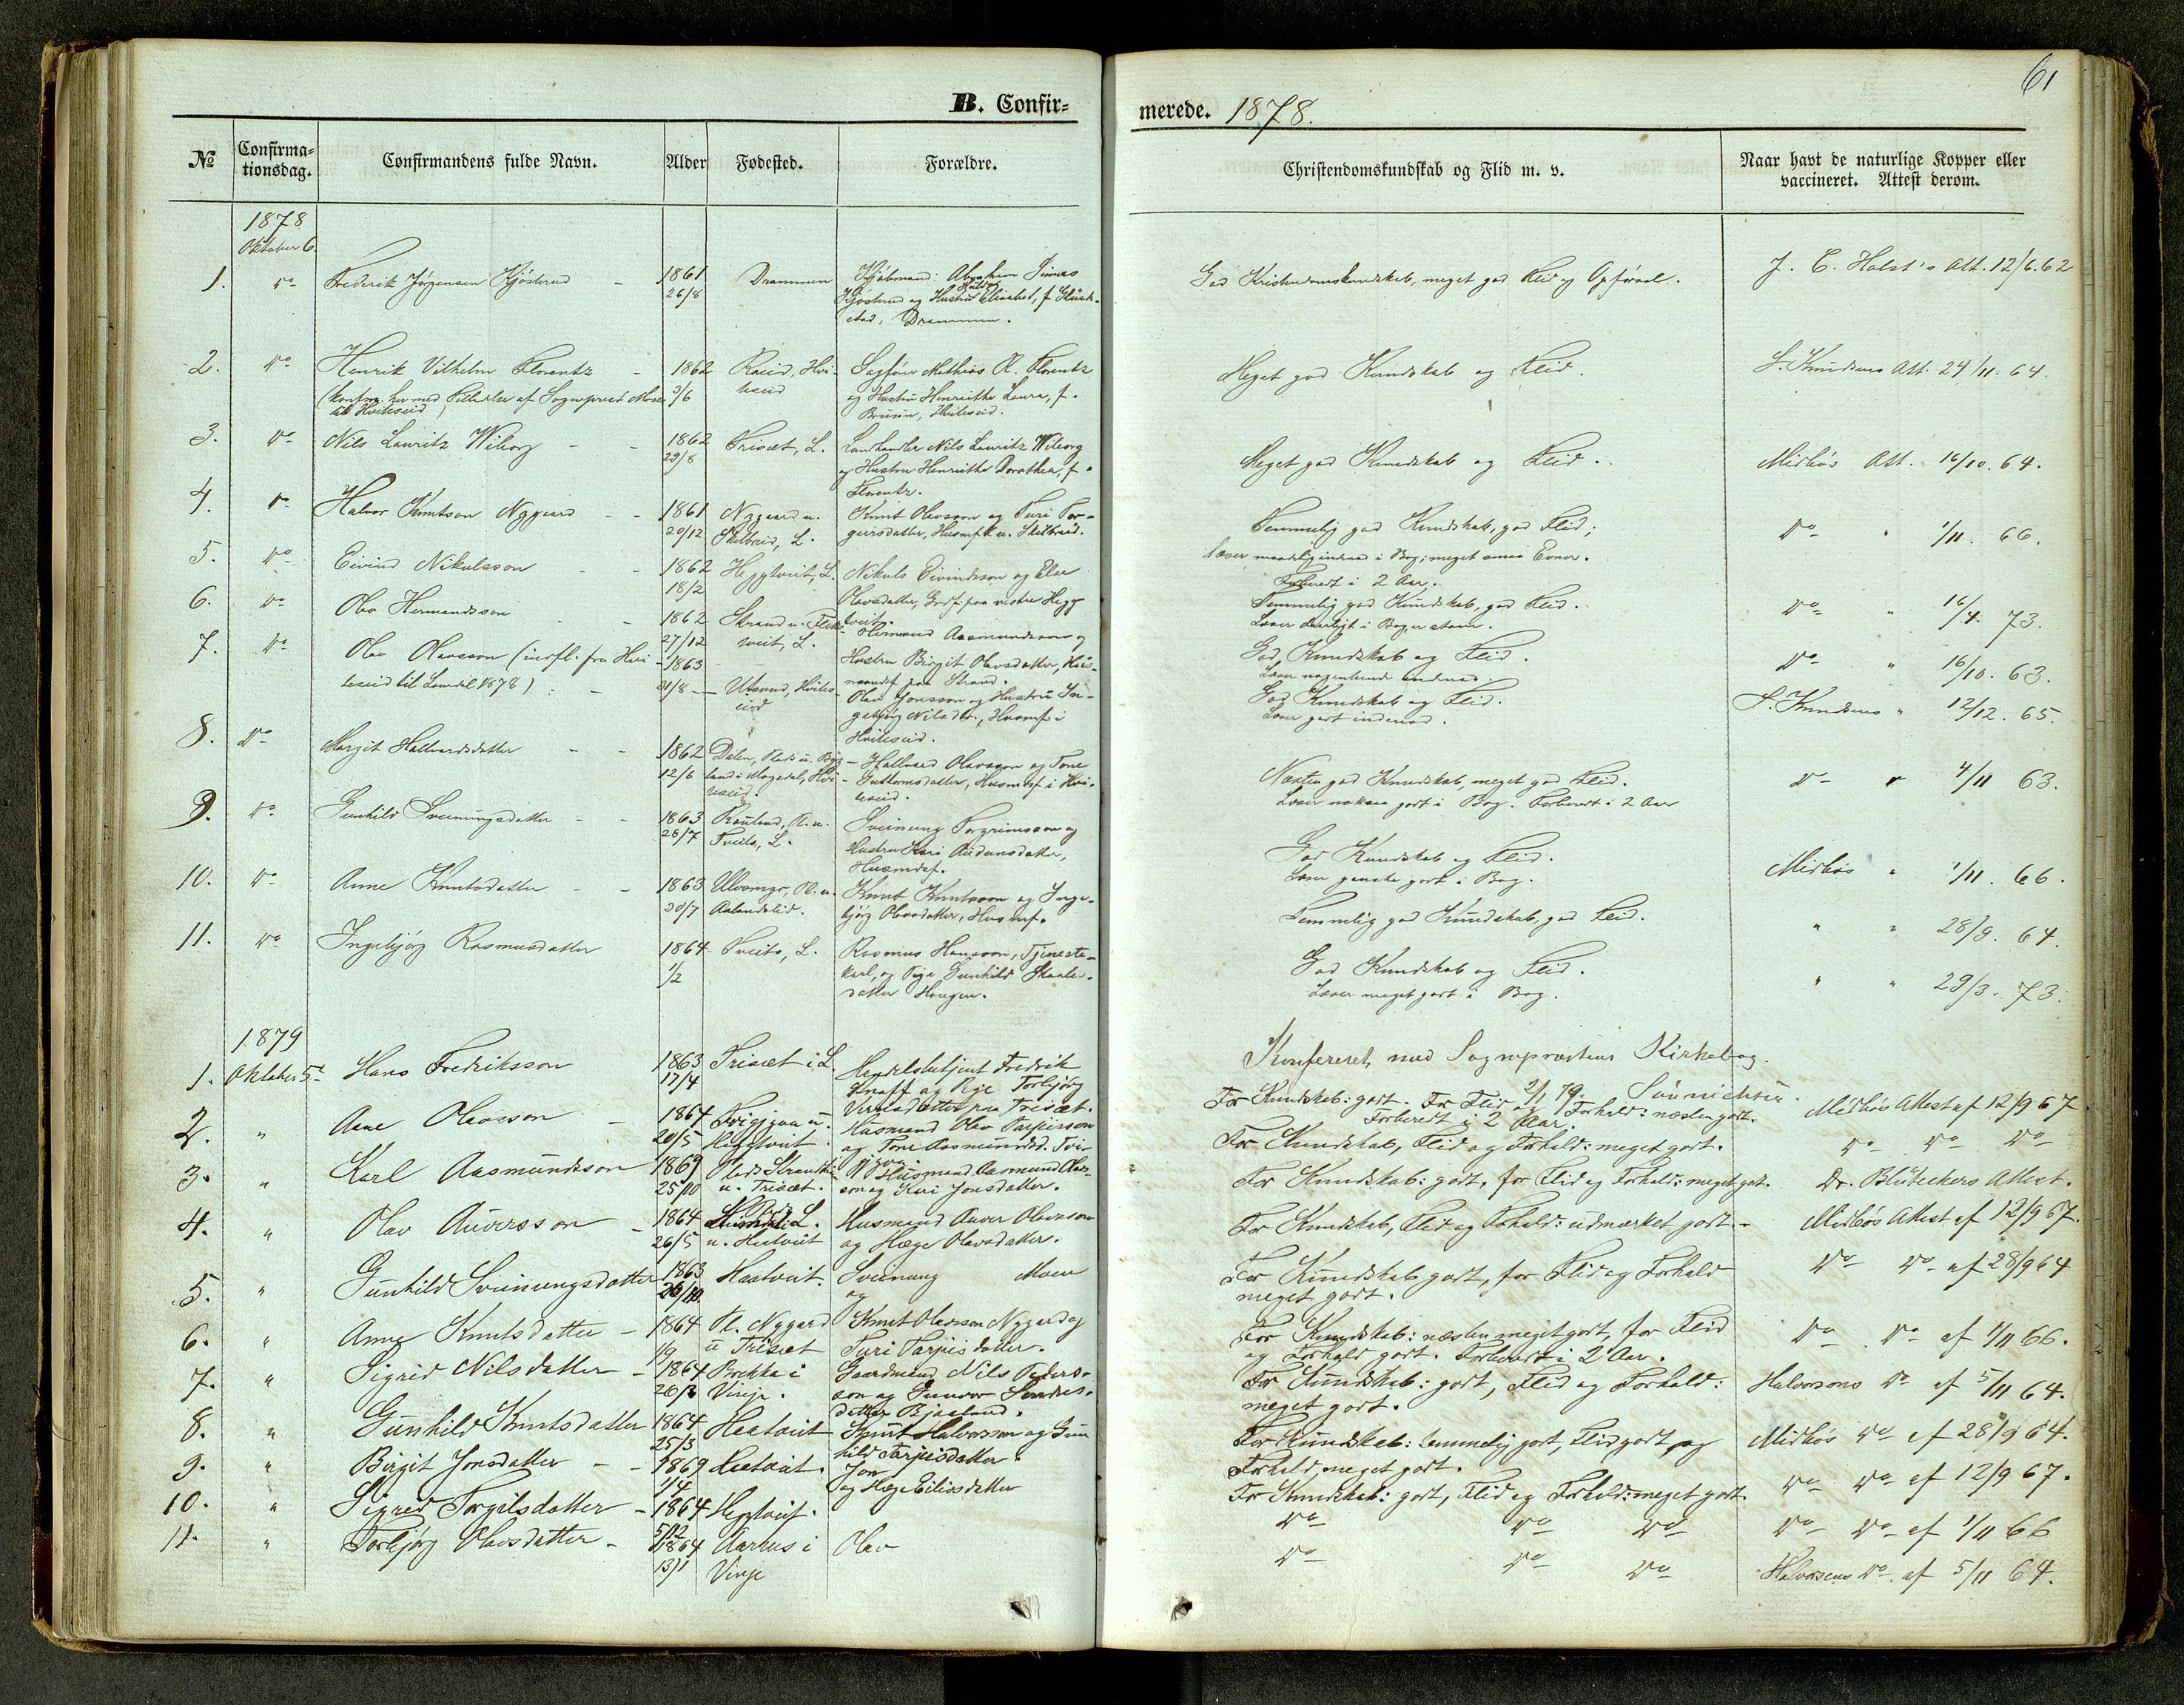 SAKO, Lårdal kirkebøker, G/Ga/L0002: Klokkerbok nr. I 2, 1861-1890, s. 61